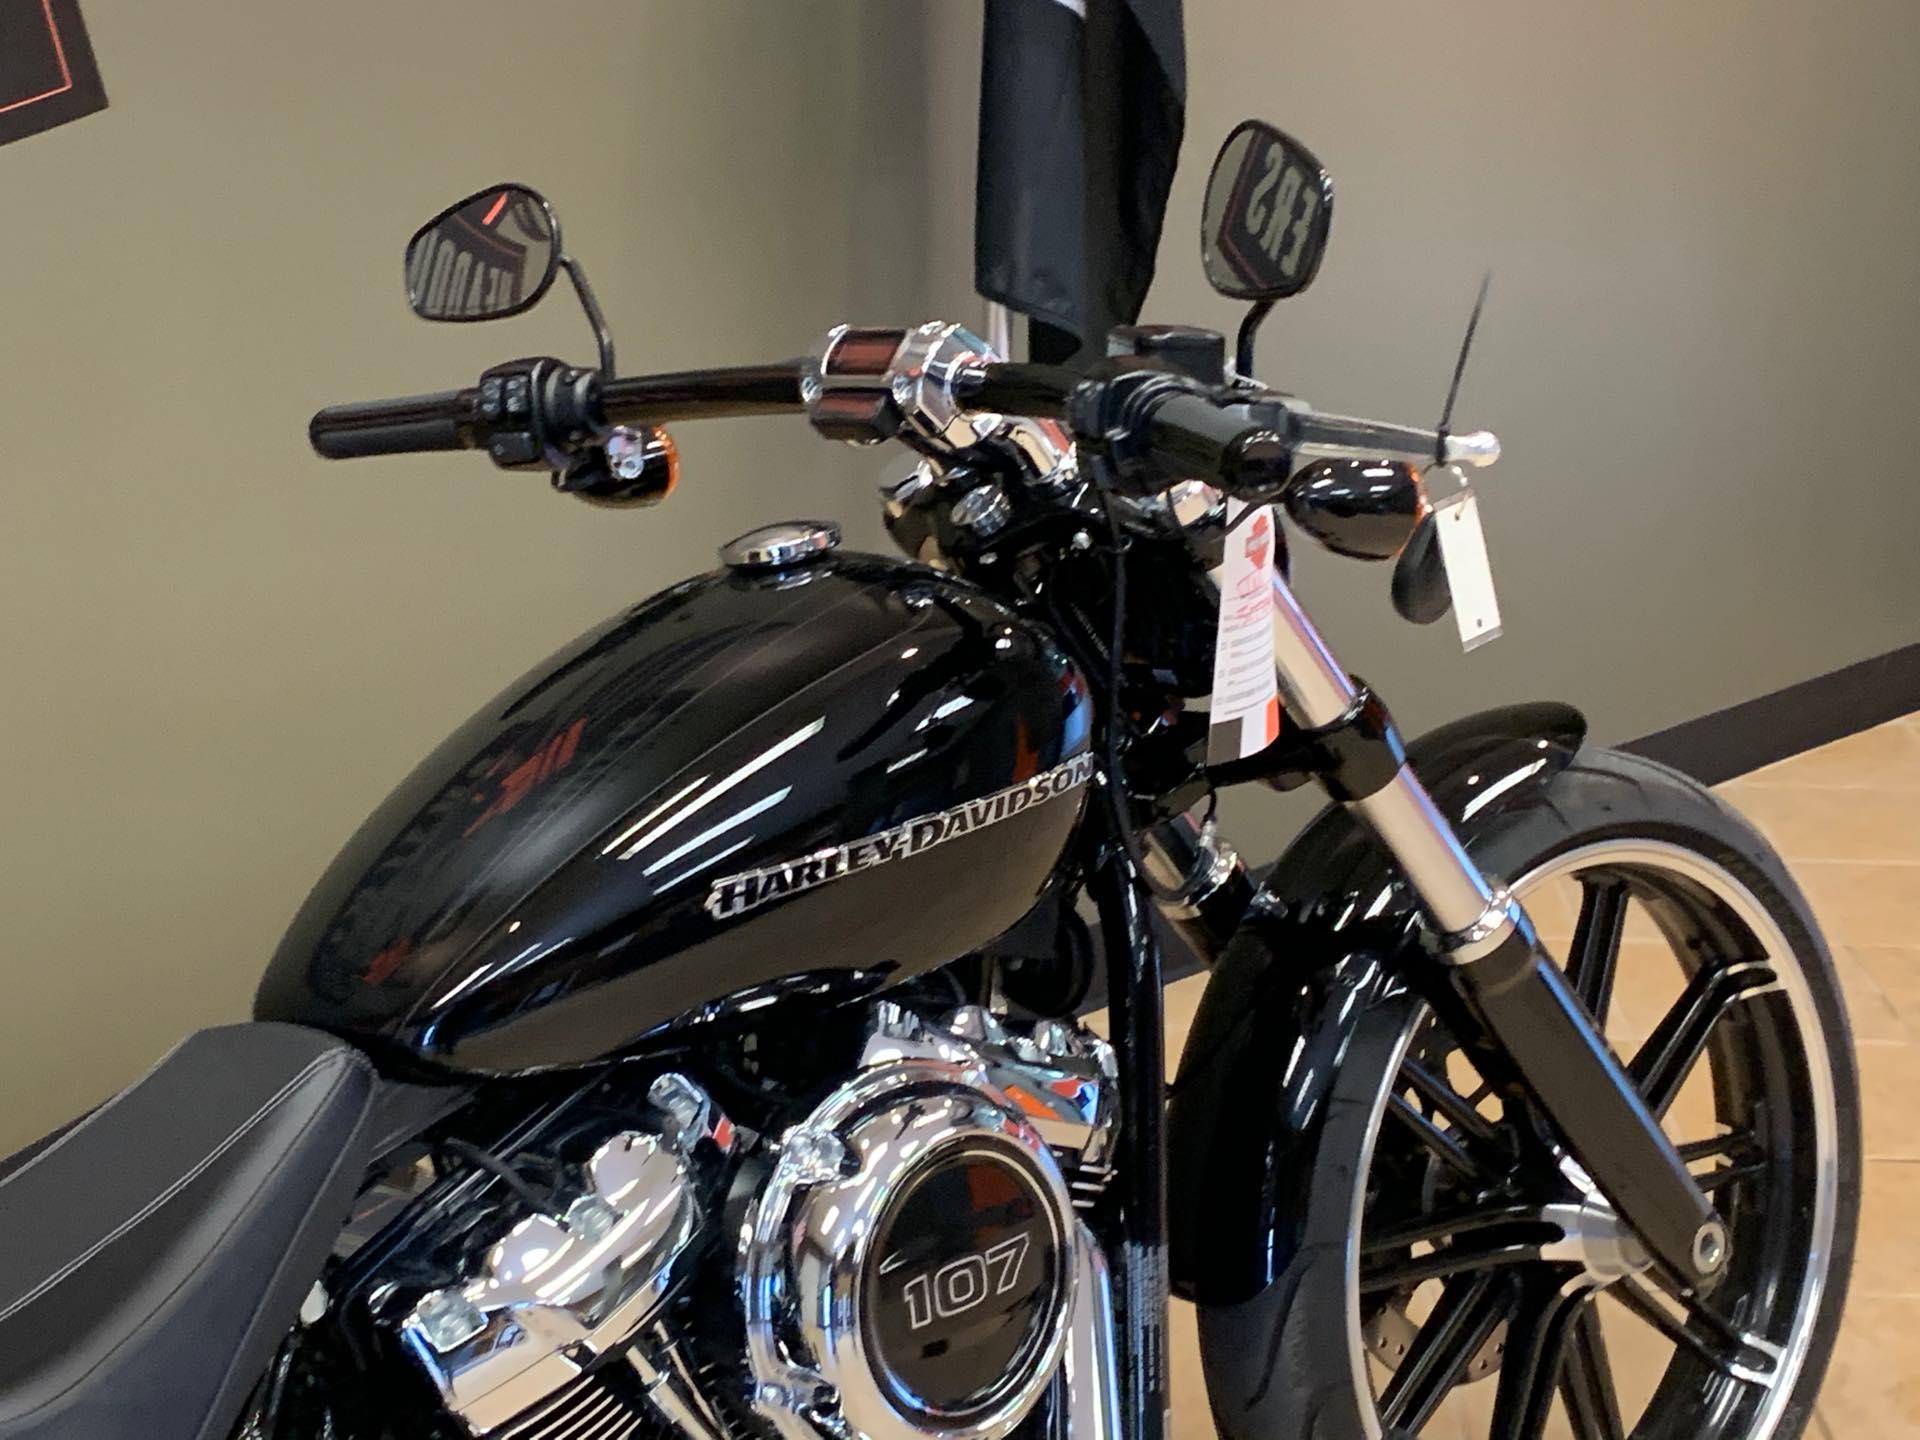 2019 Harley-Davidson Softail Breakout at Loess Hills Harley-Davidson